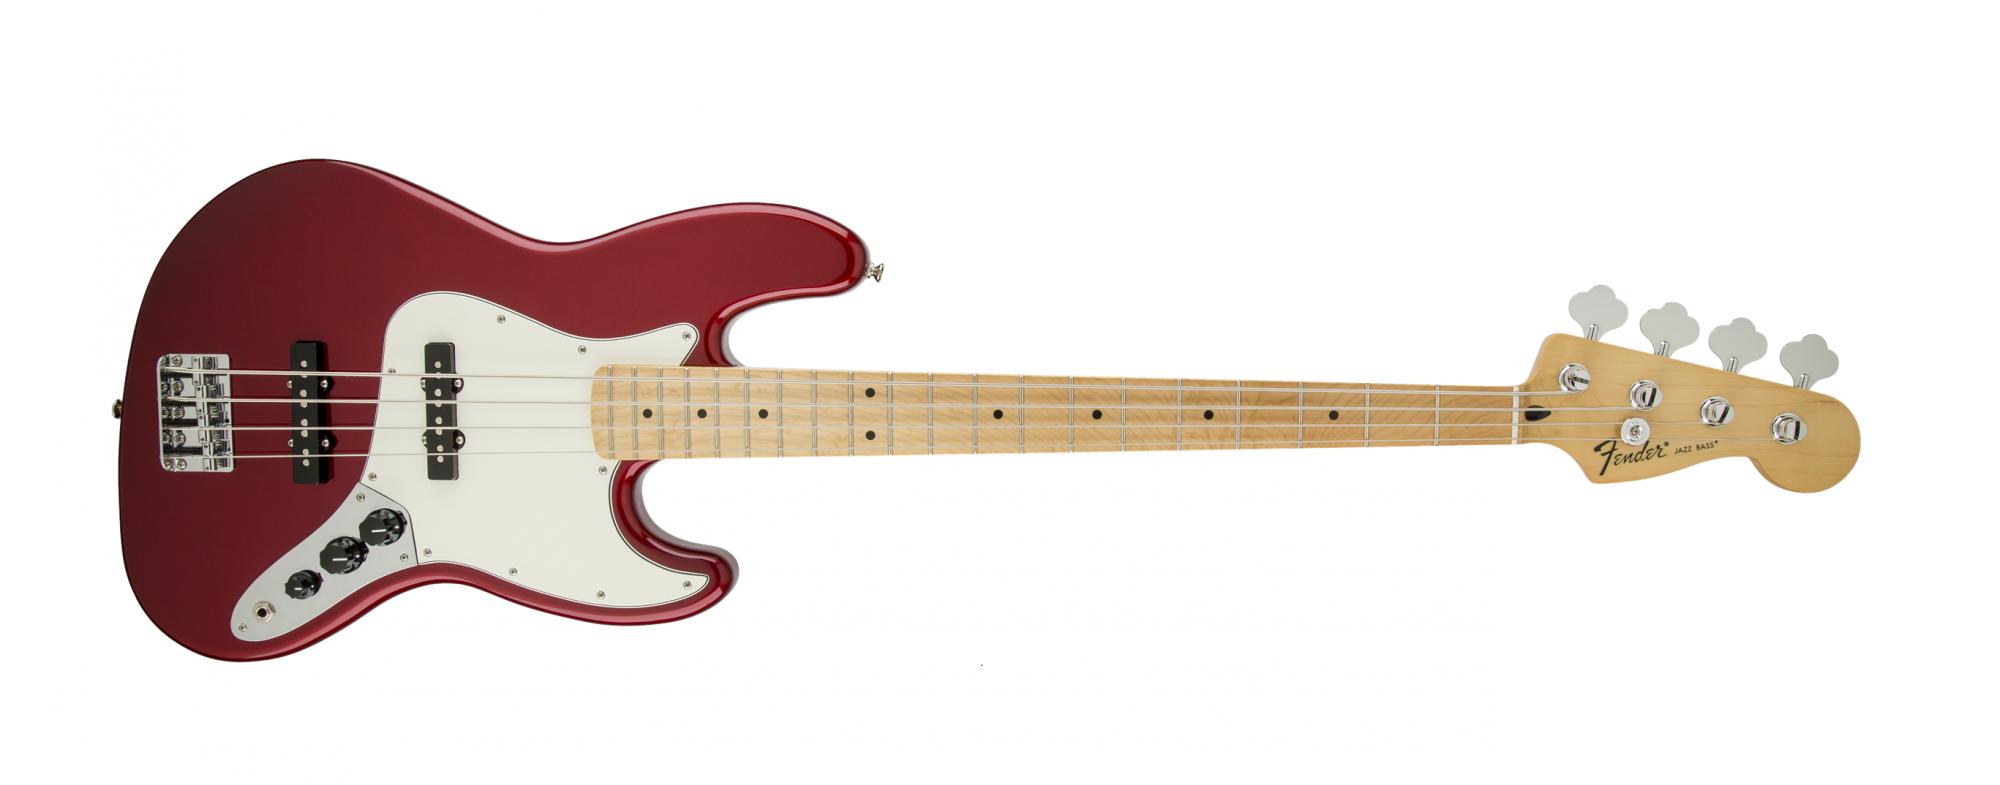 Fender Standard Jazz Bass MN Candy Apple Red